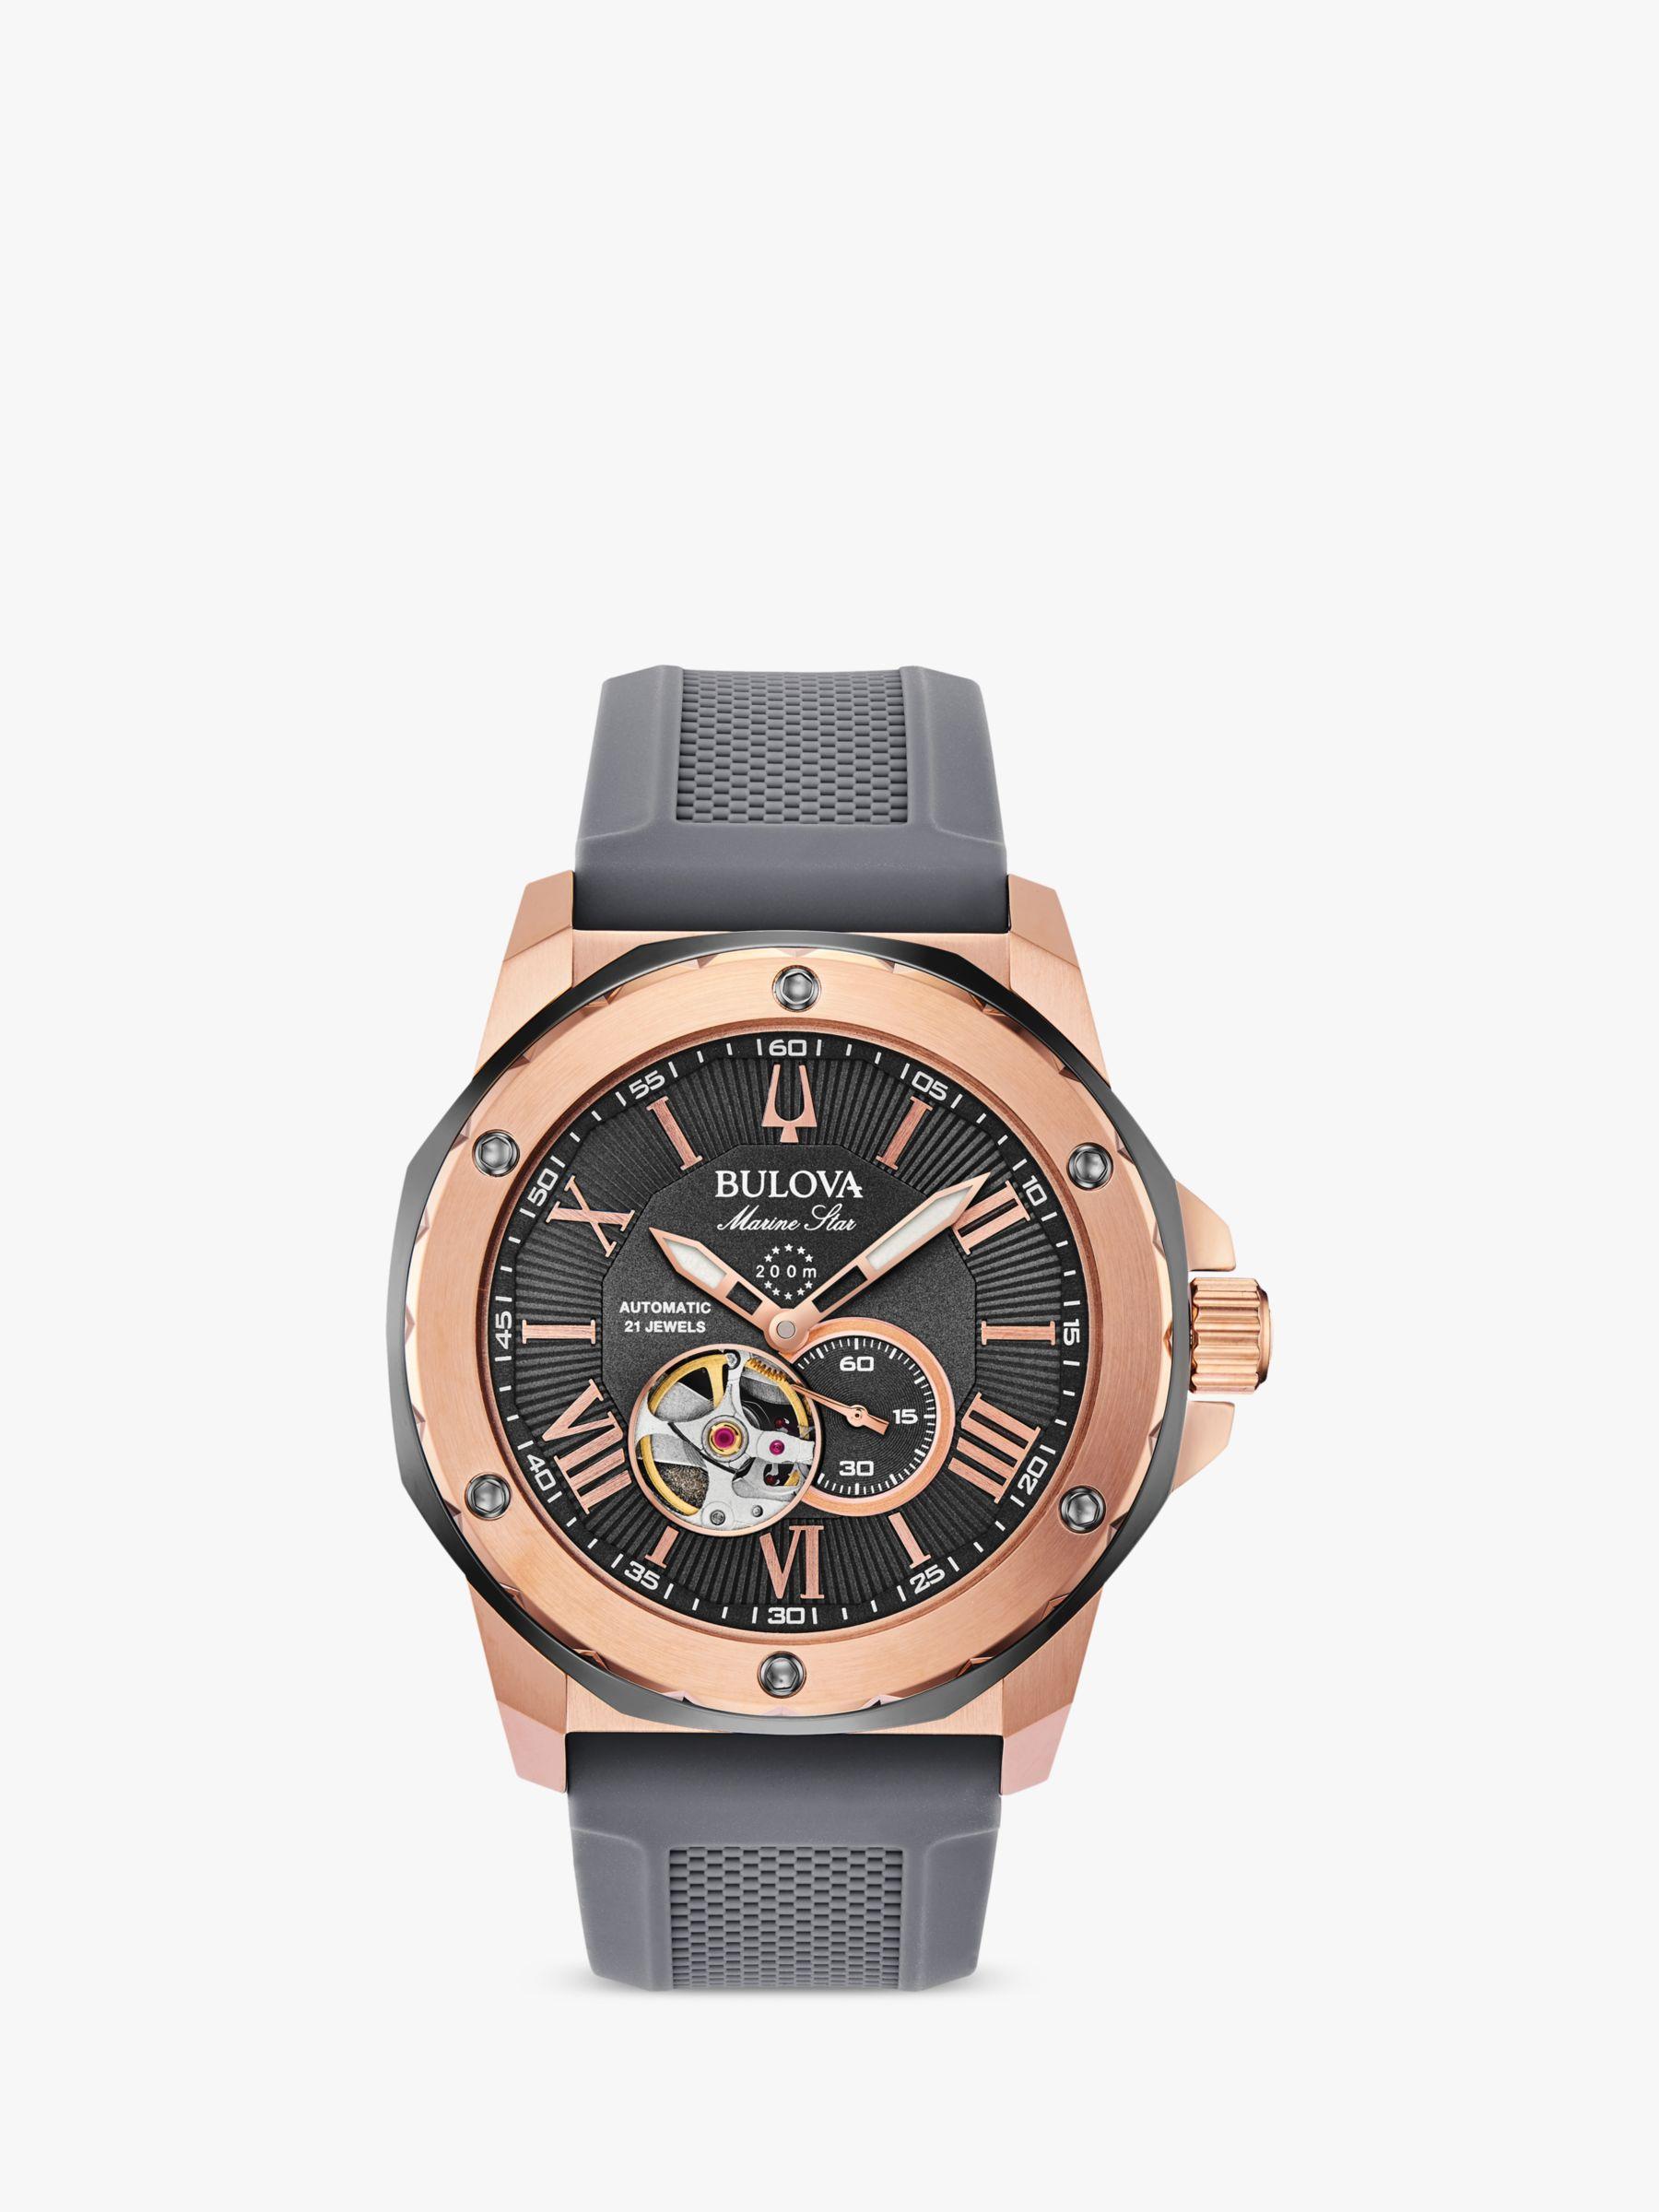 Bulova Bulova Men's Marine Star Heartbeat Automatic Silicone Strap Watch